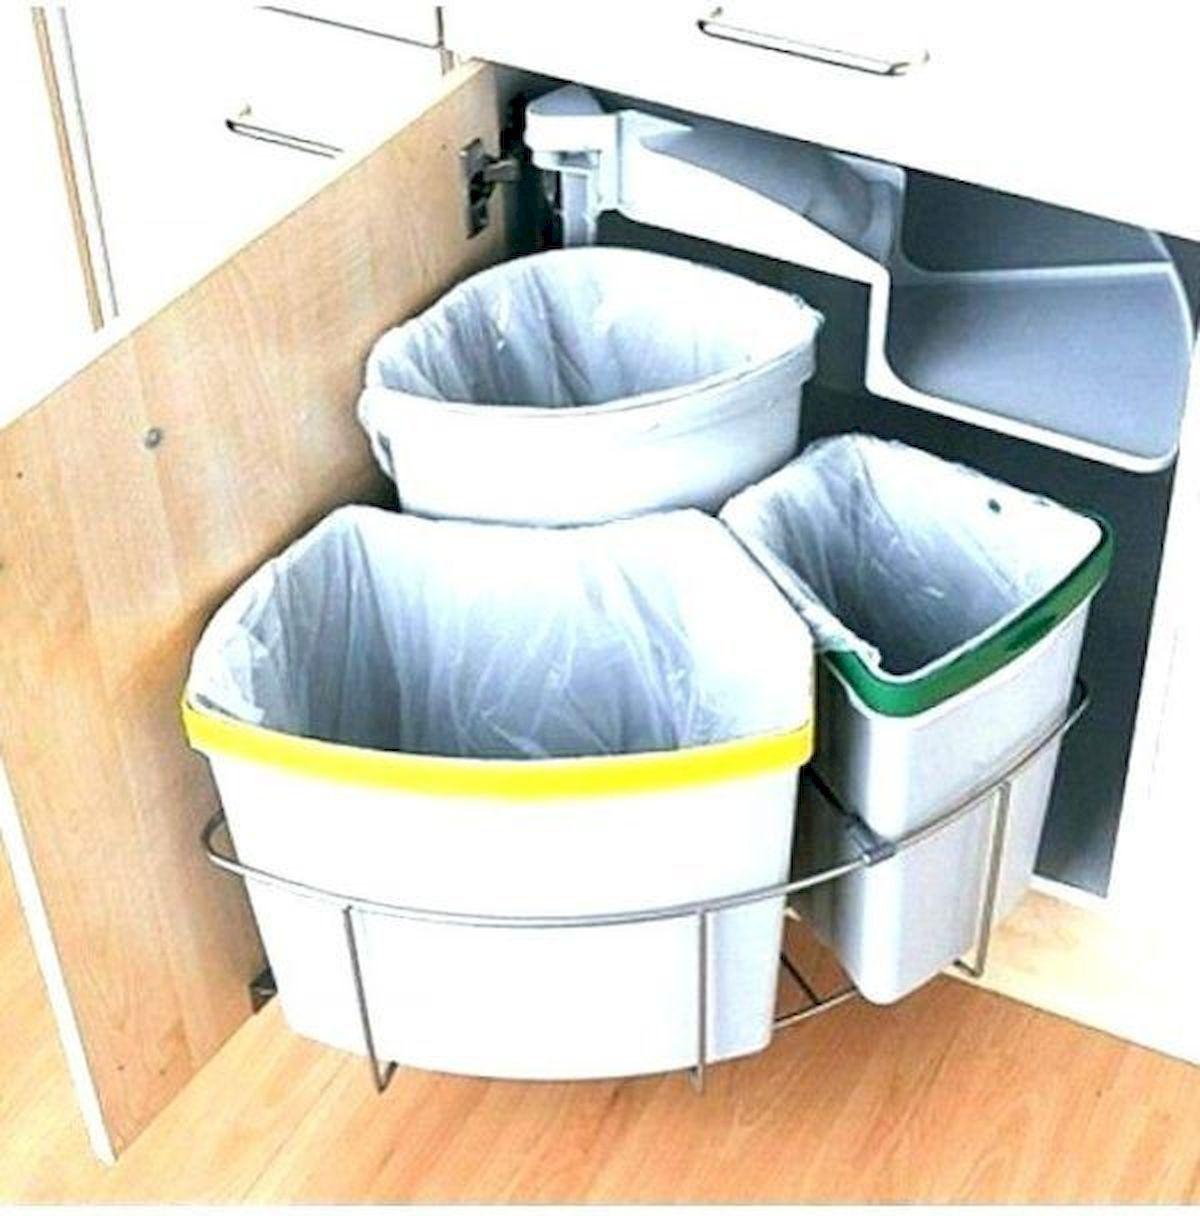 Kitchen Recycling Bins For Good Waste Management Https Hajarfresh Com Kitchen Recycling Bins For Goo Clever Kitchen Storage Trash Can Cabinet Kitchen Storage